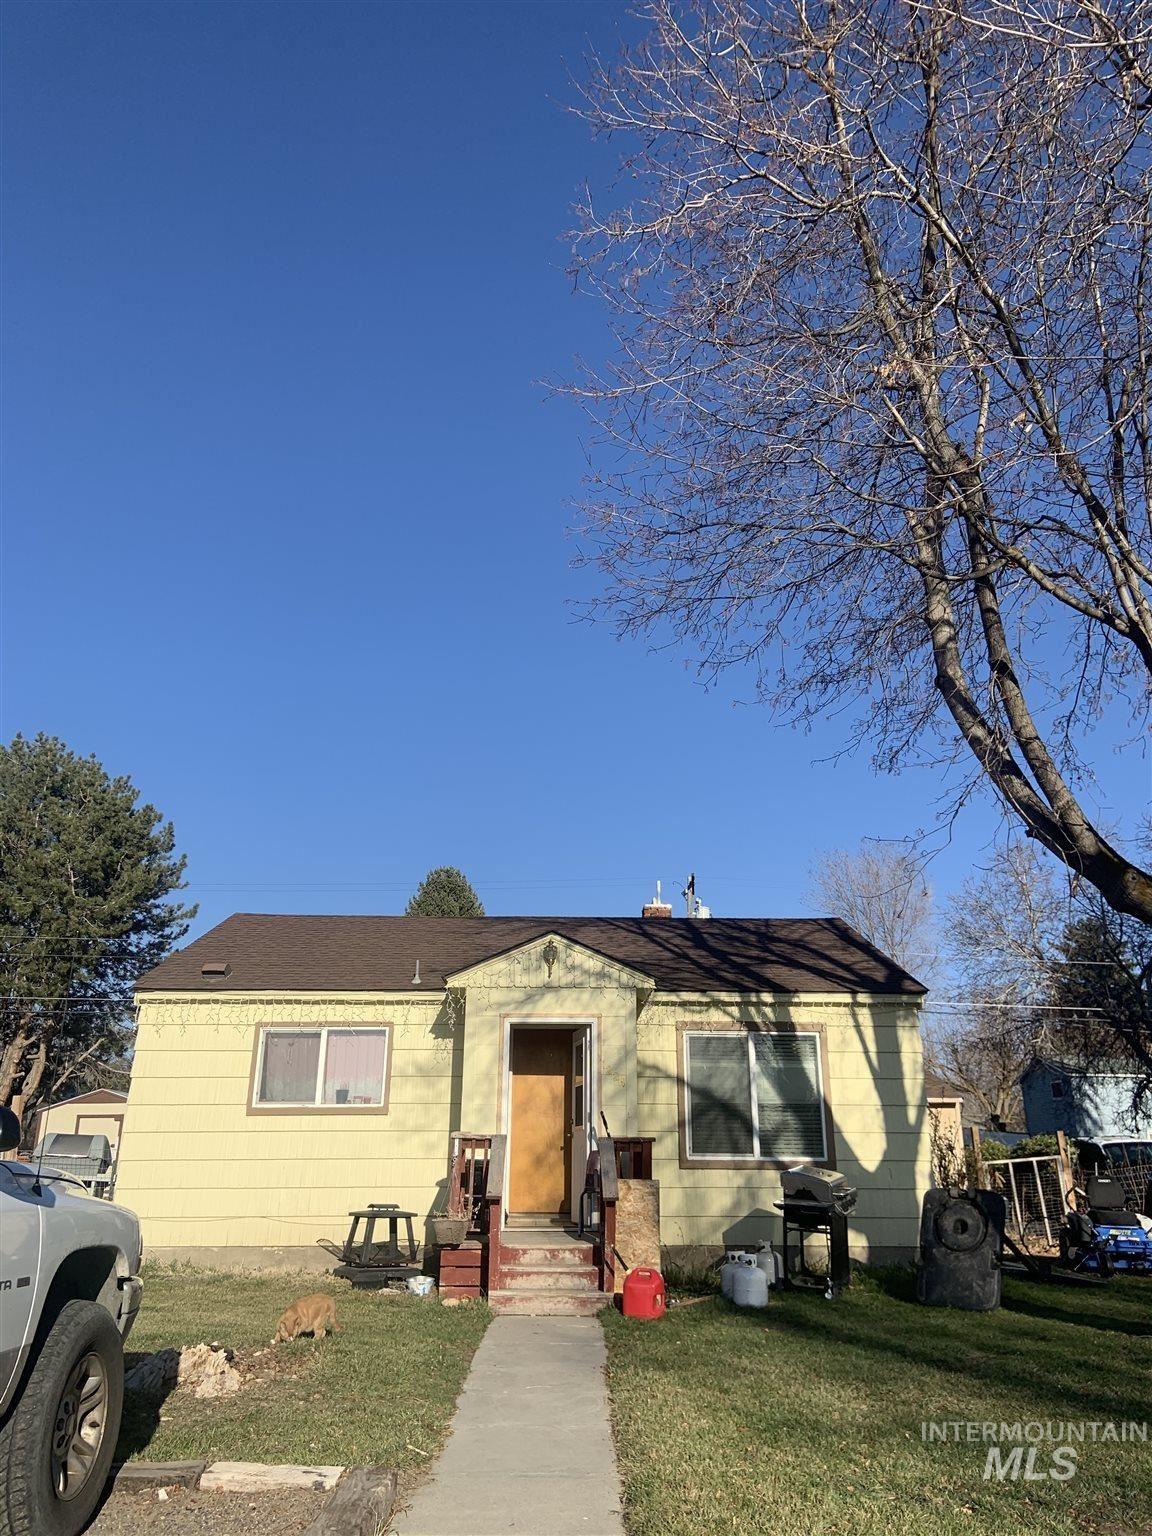 Photo of 1224 Colorado Street, Gooding, ID 83330-9999 (MLS # 98798396)